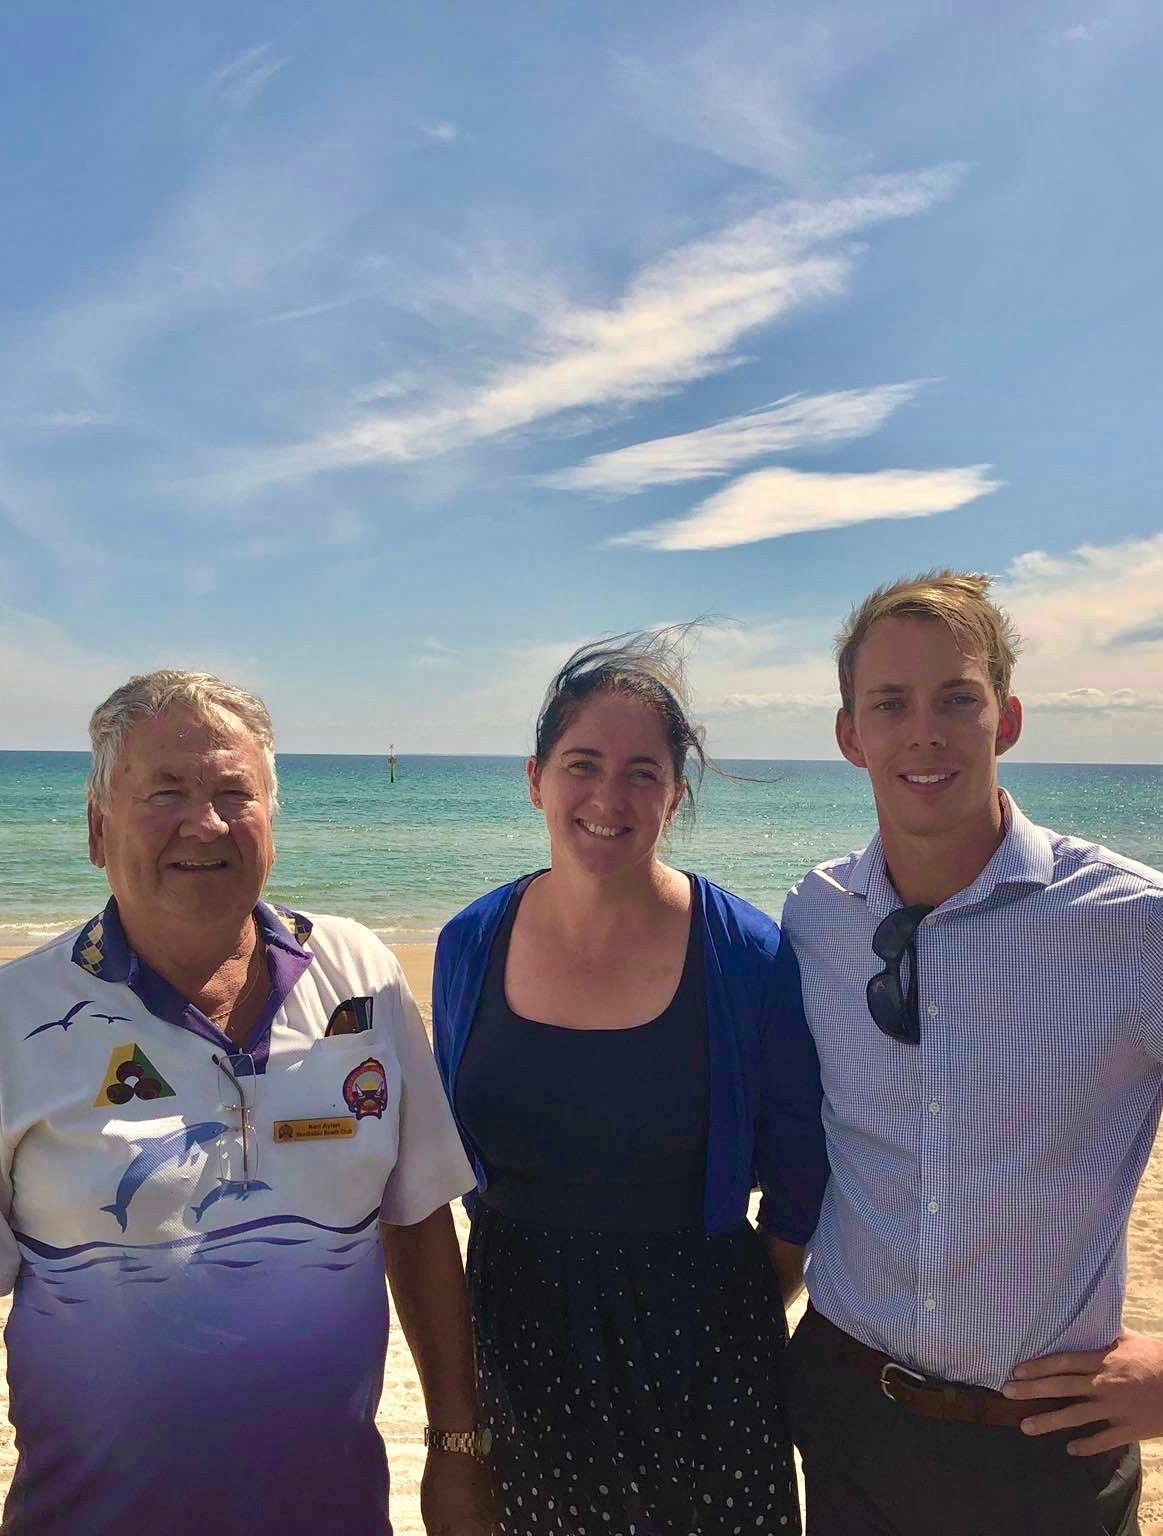 Ken Aylen, Cr Tamsin Bearsley and Cameron Howe at Gnotuk Avenue, Aspendale Beach